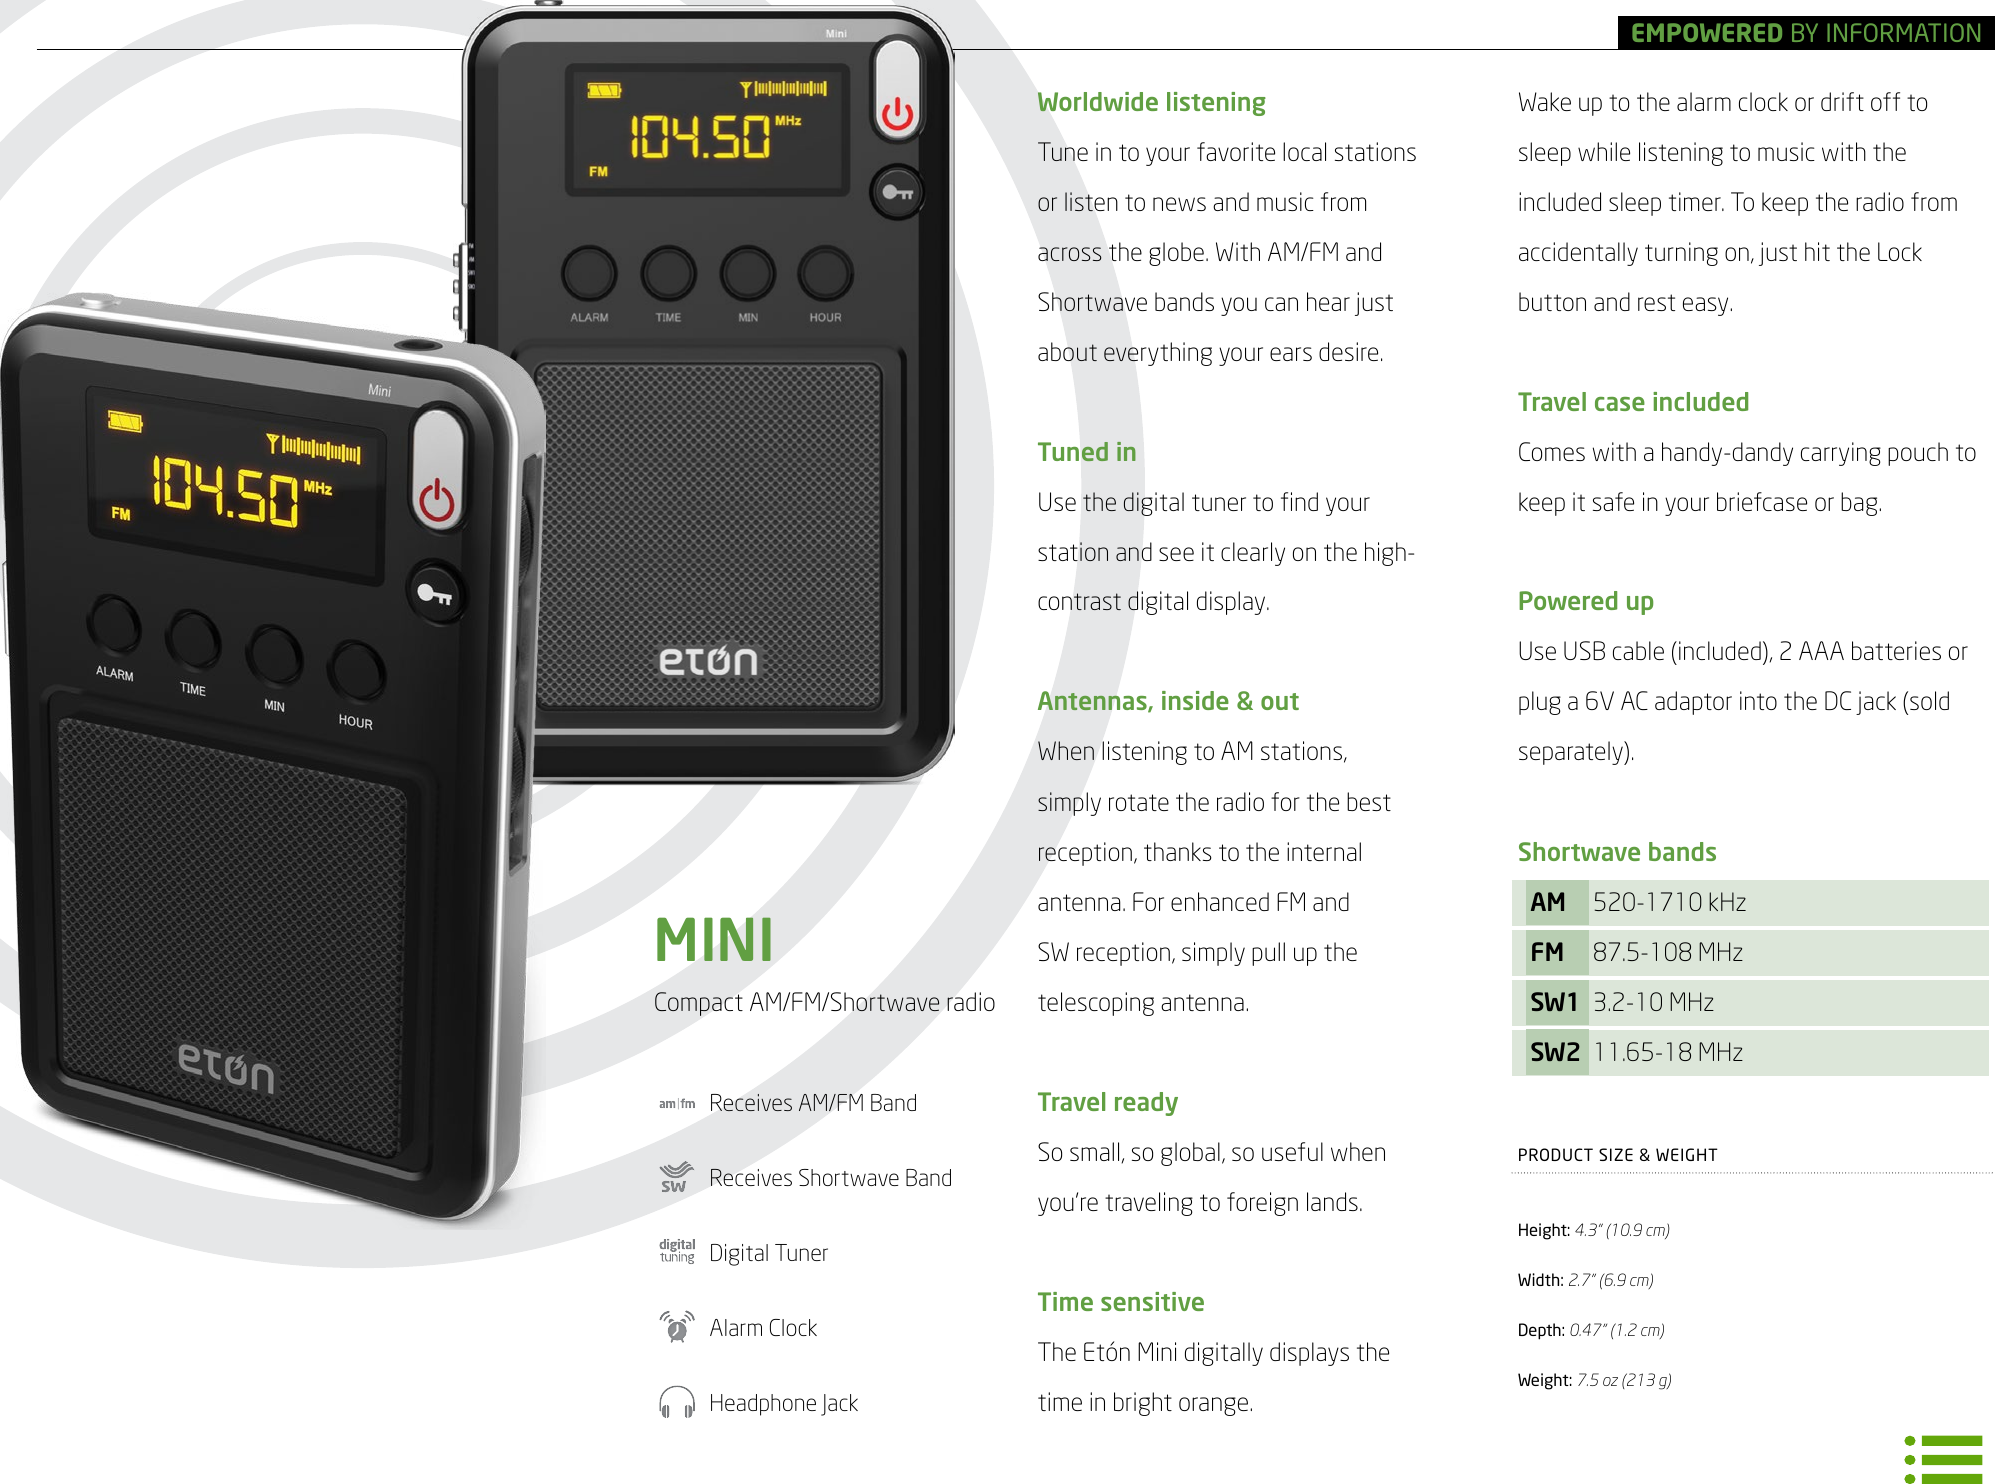 Eton Corporation Radio Frx4 S Users Manual